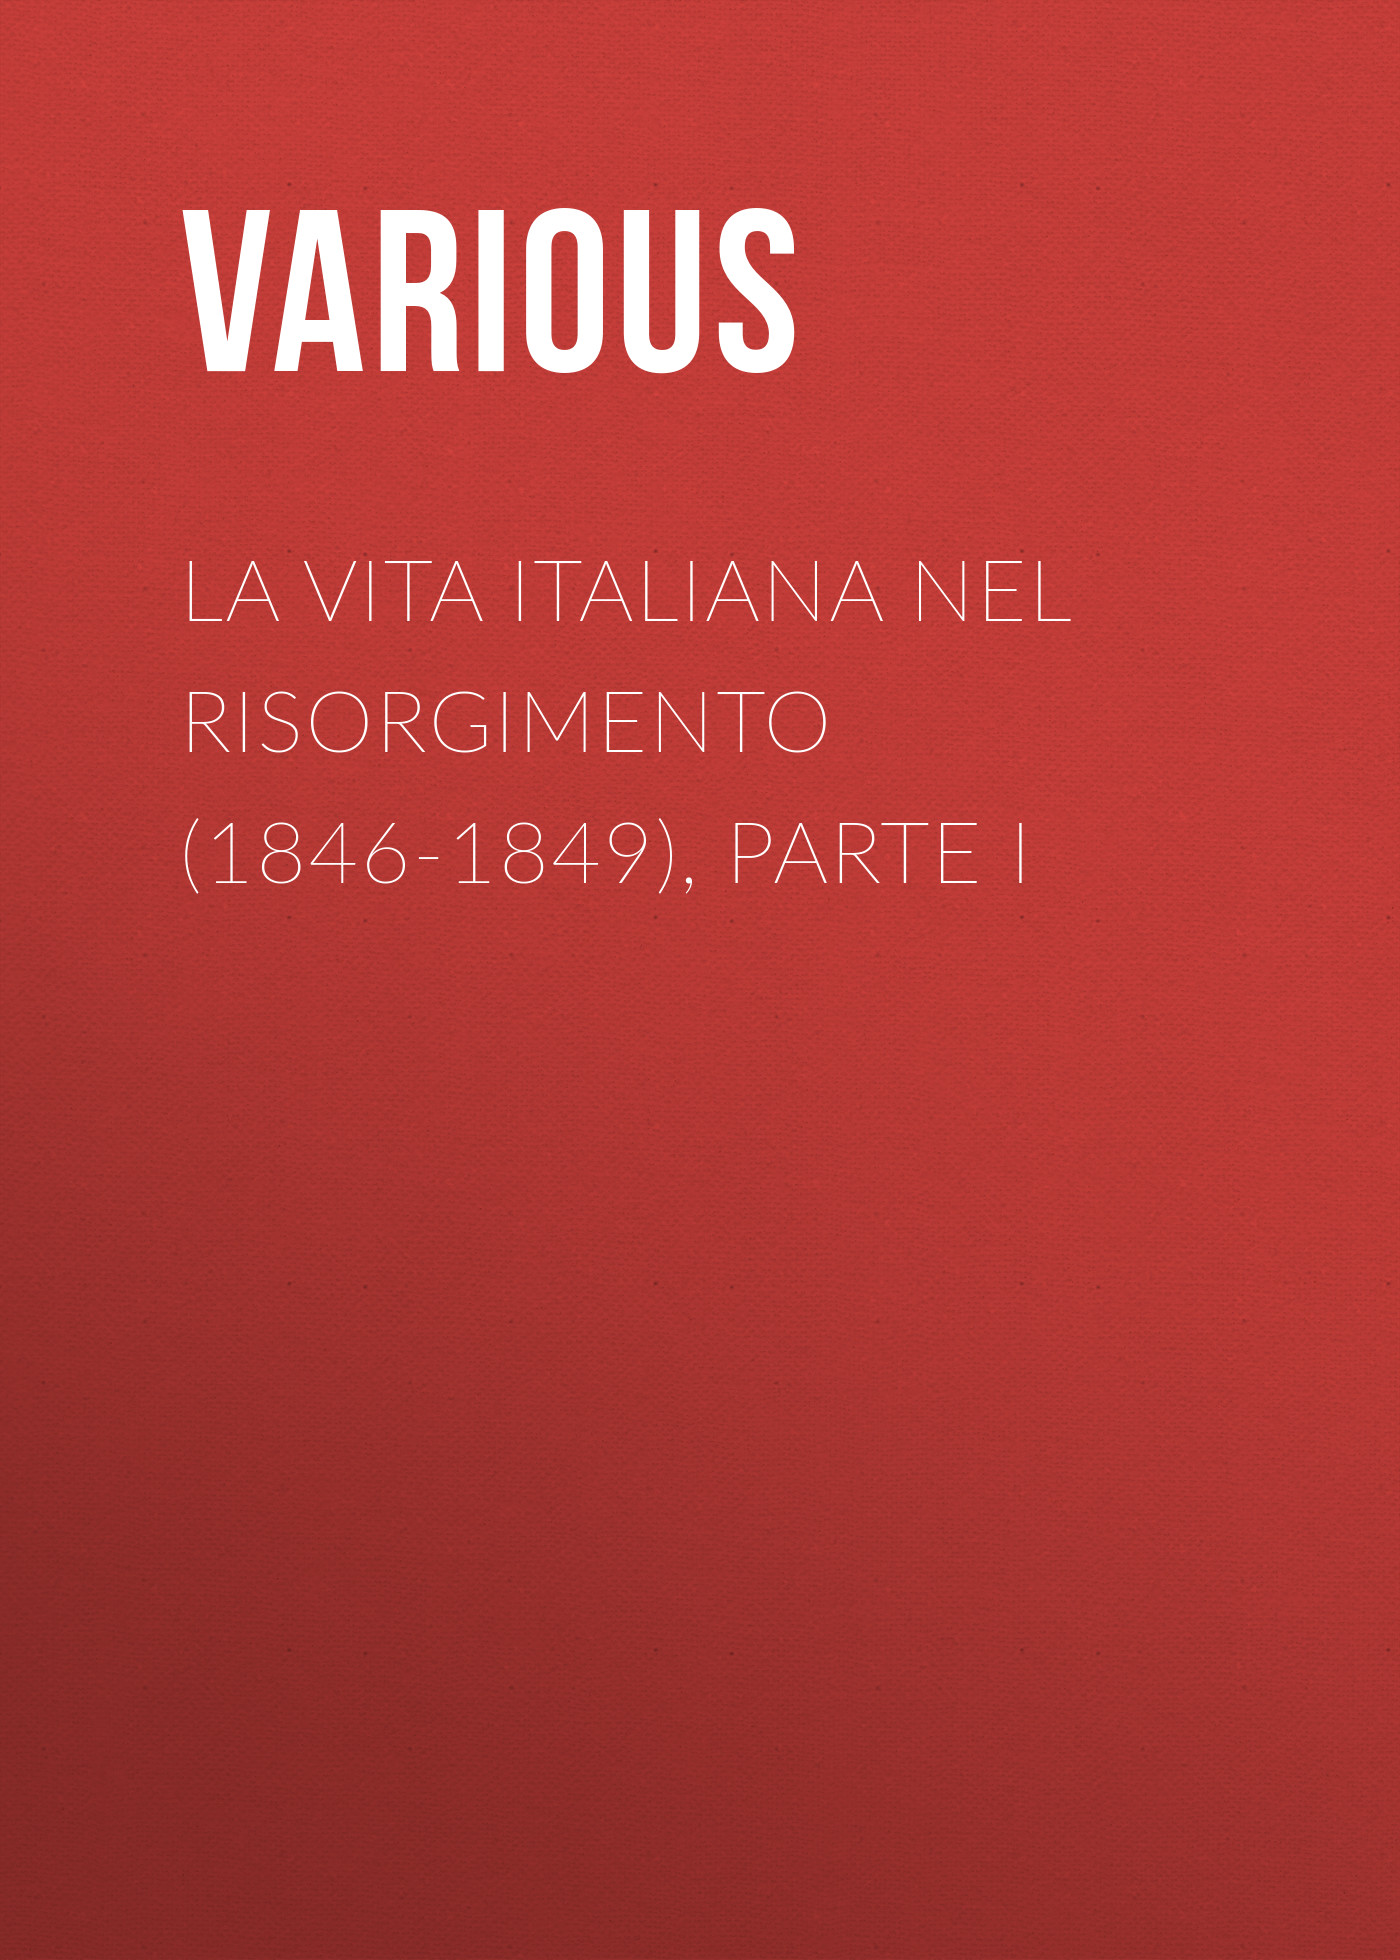 Various La vita Italiana nel Risorgimento (1846-1849), parte I bersezio vittorio la plebe parte i